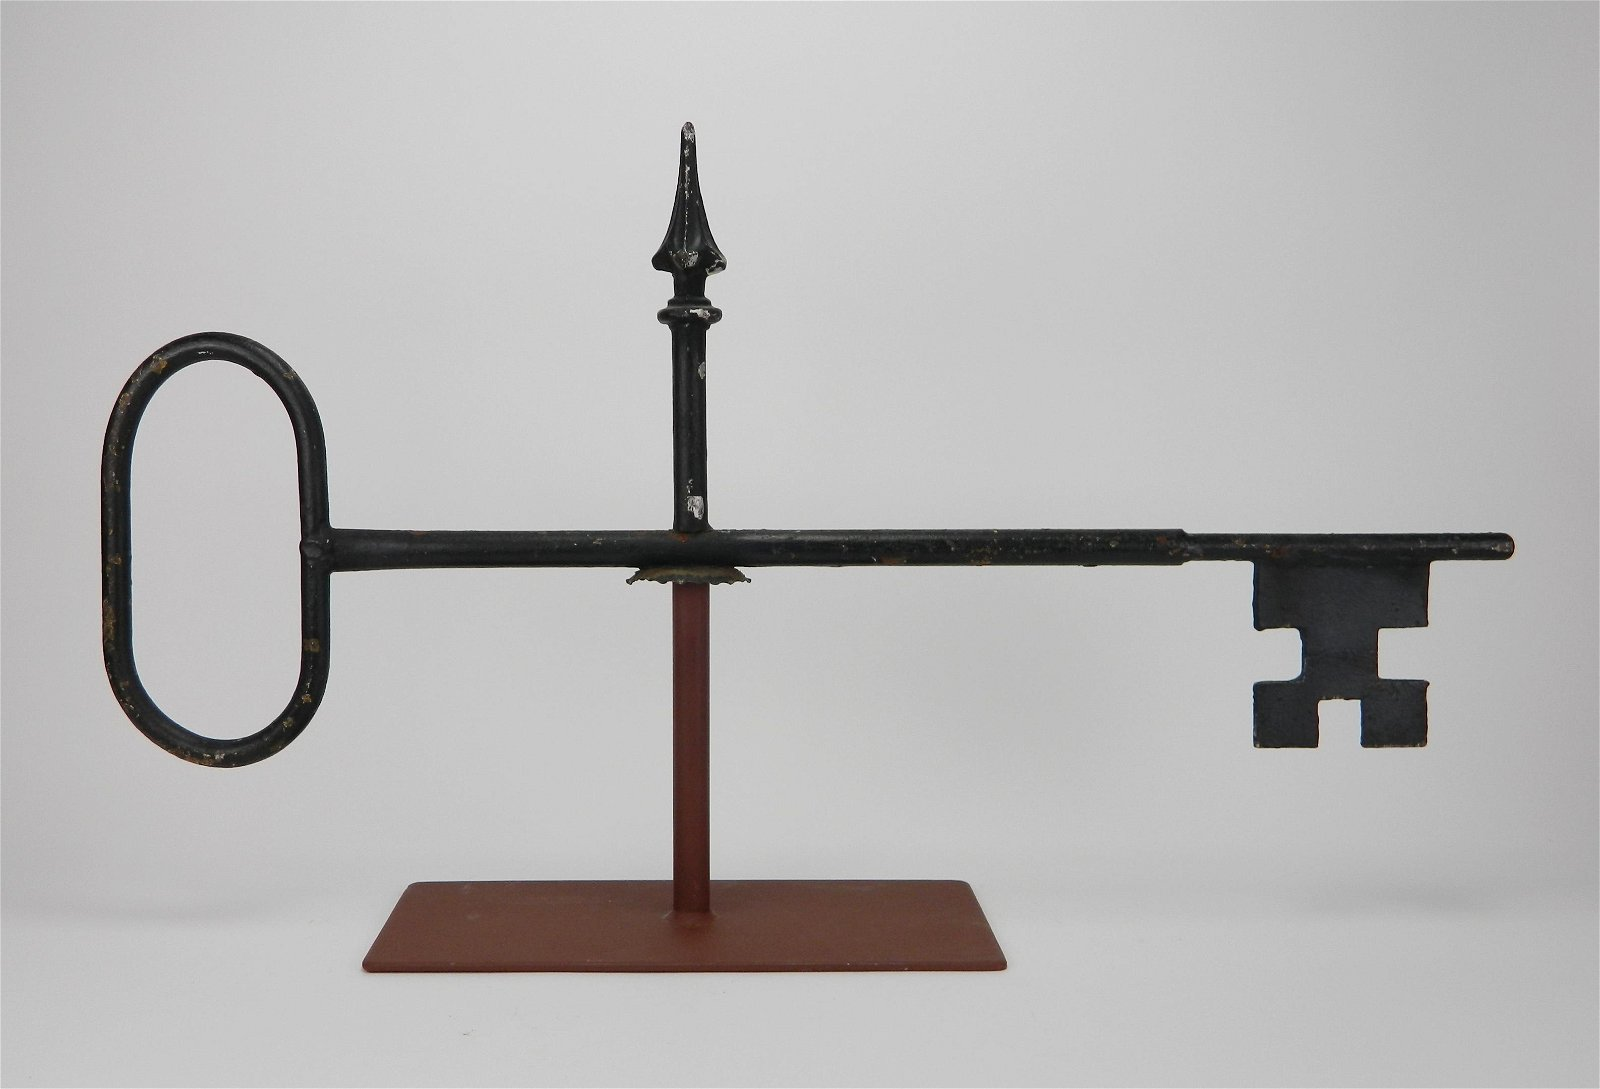 Iron 'Key' weathervane